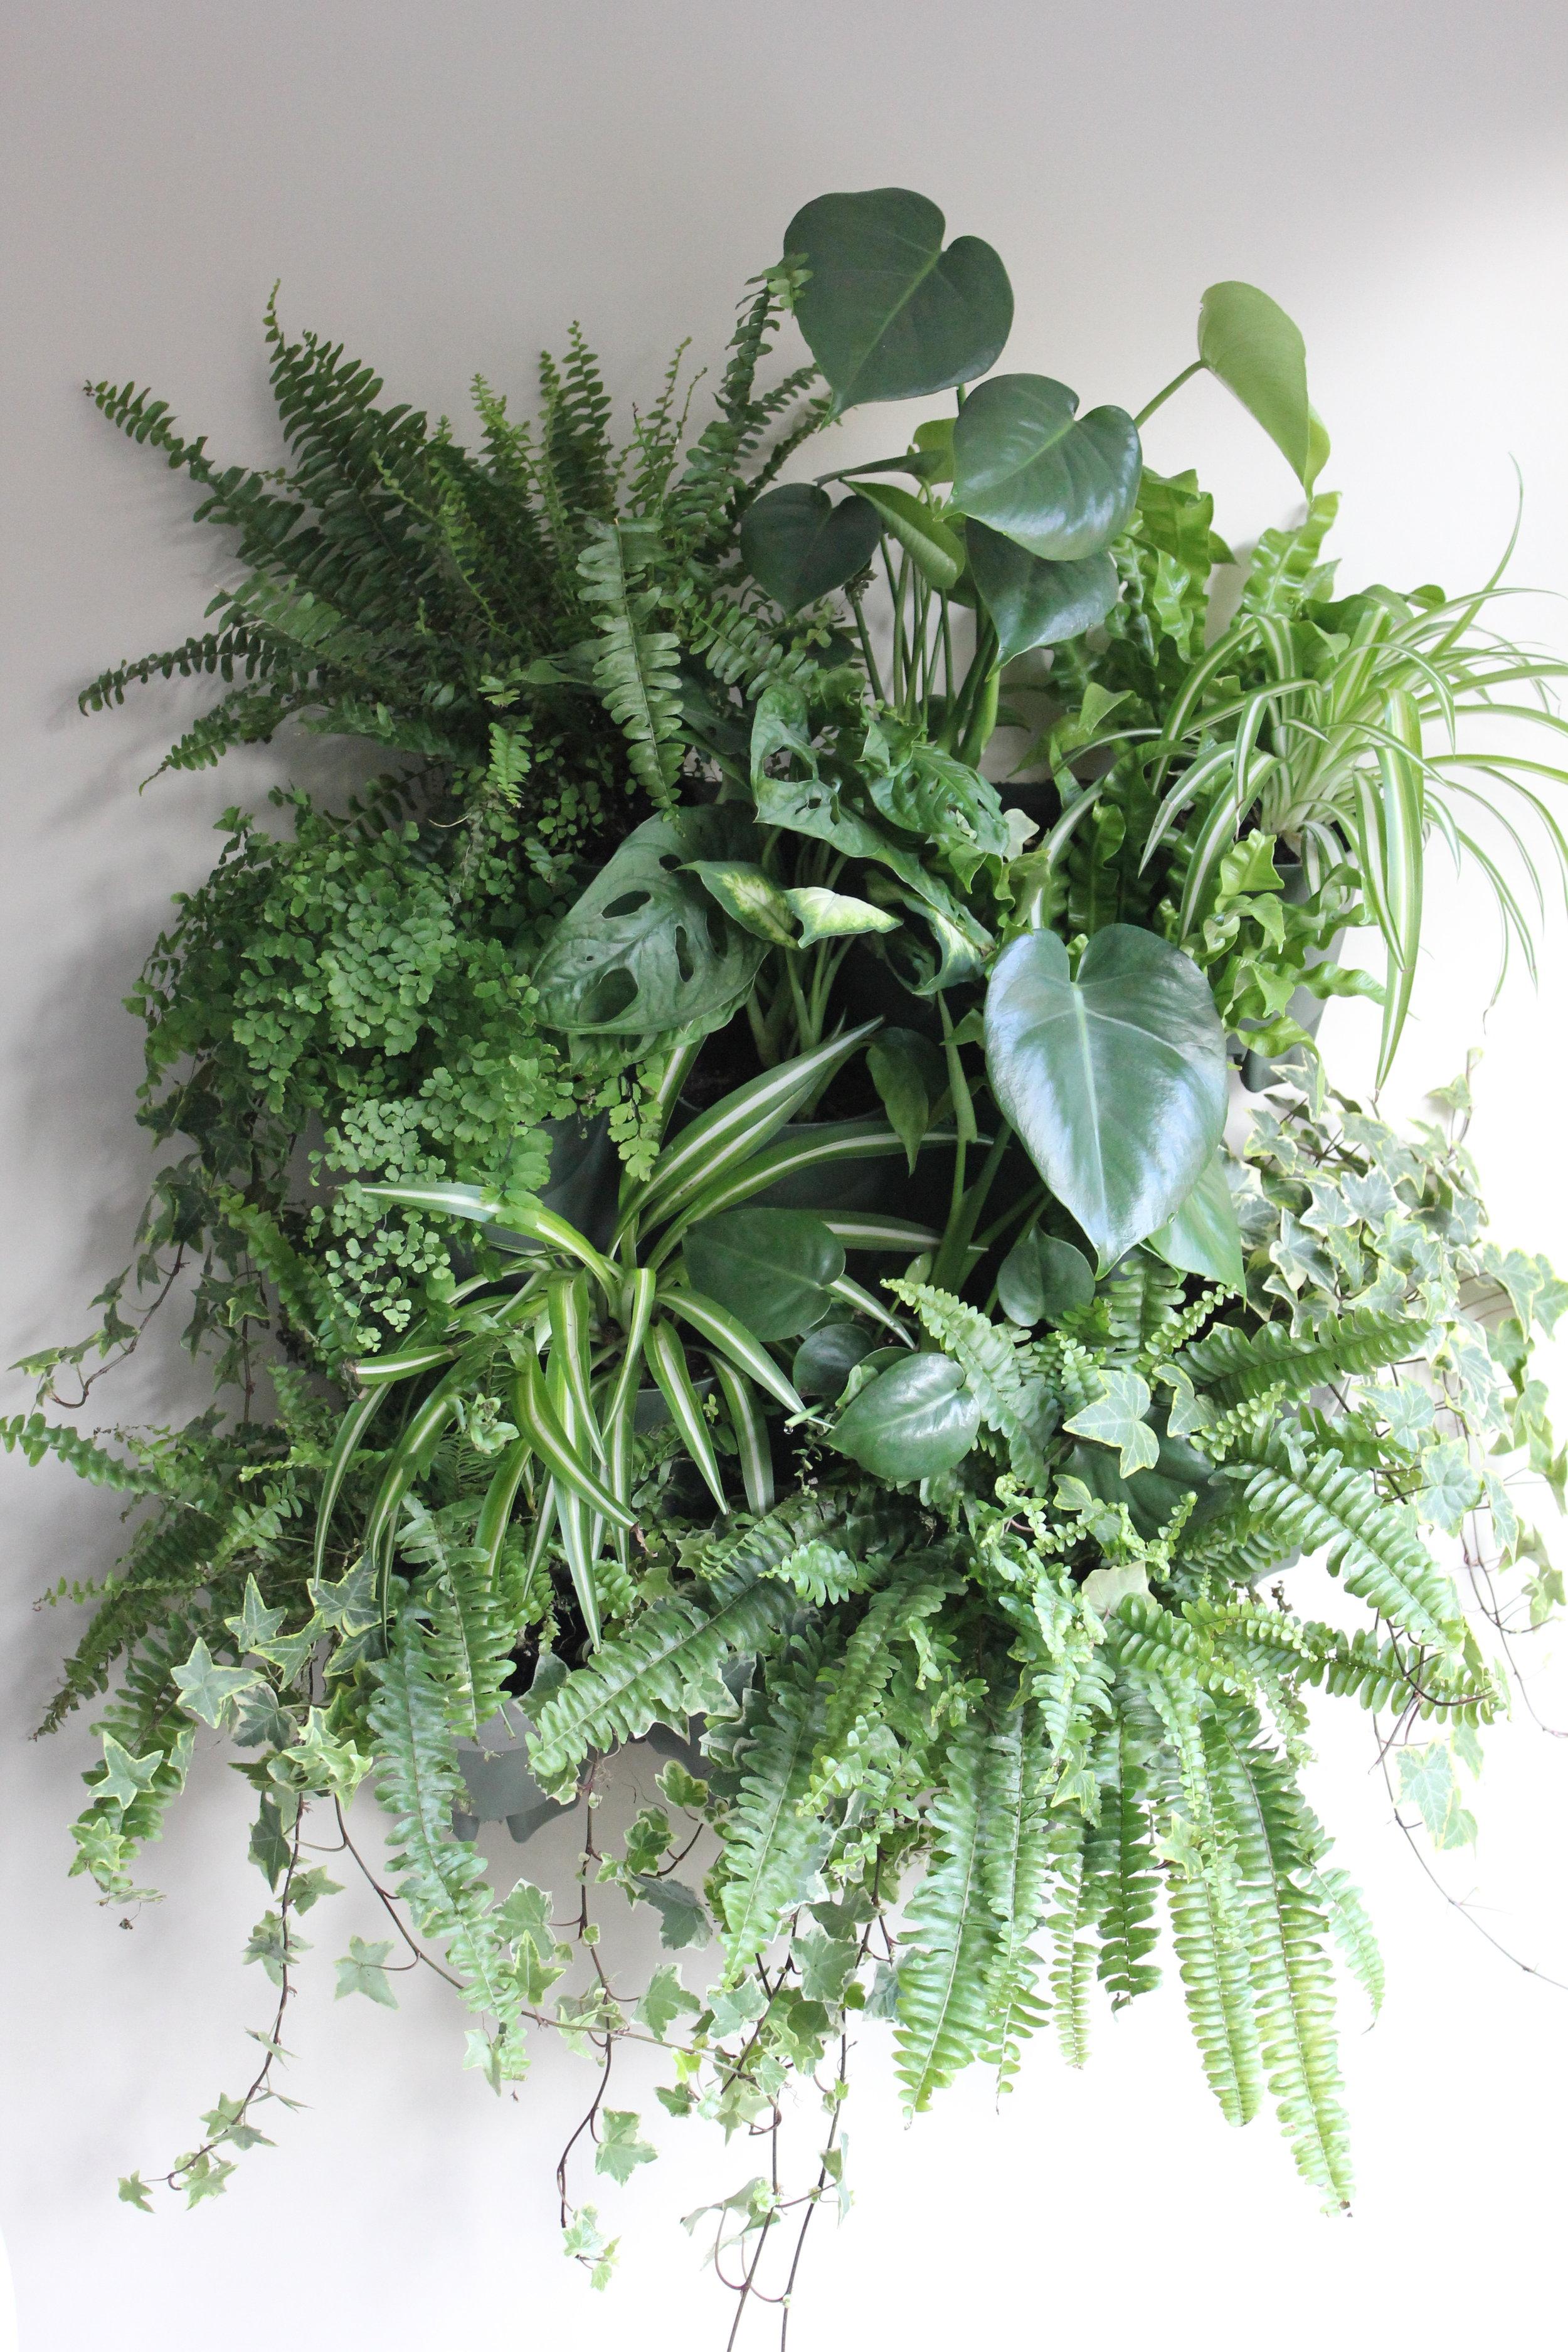 Dobbies Living Wall Kit.  Various House Plants